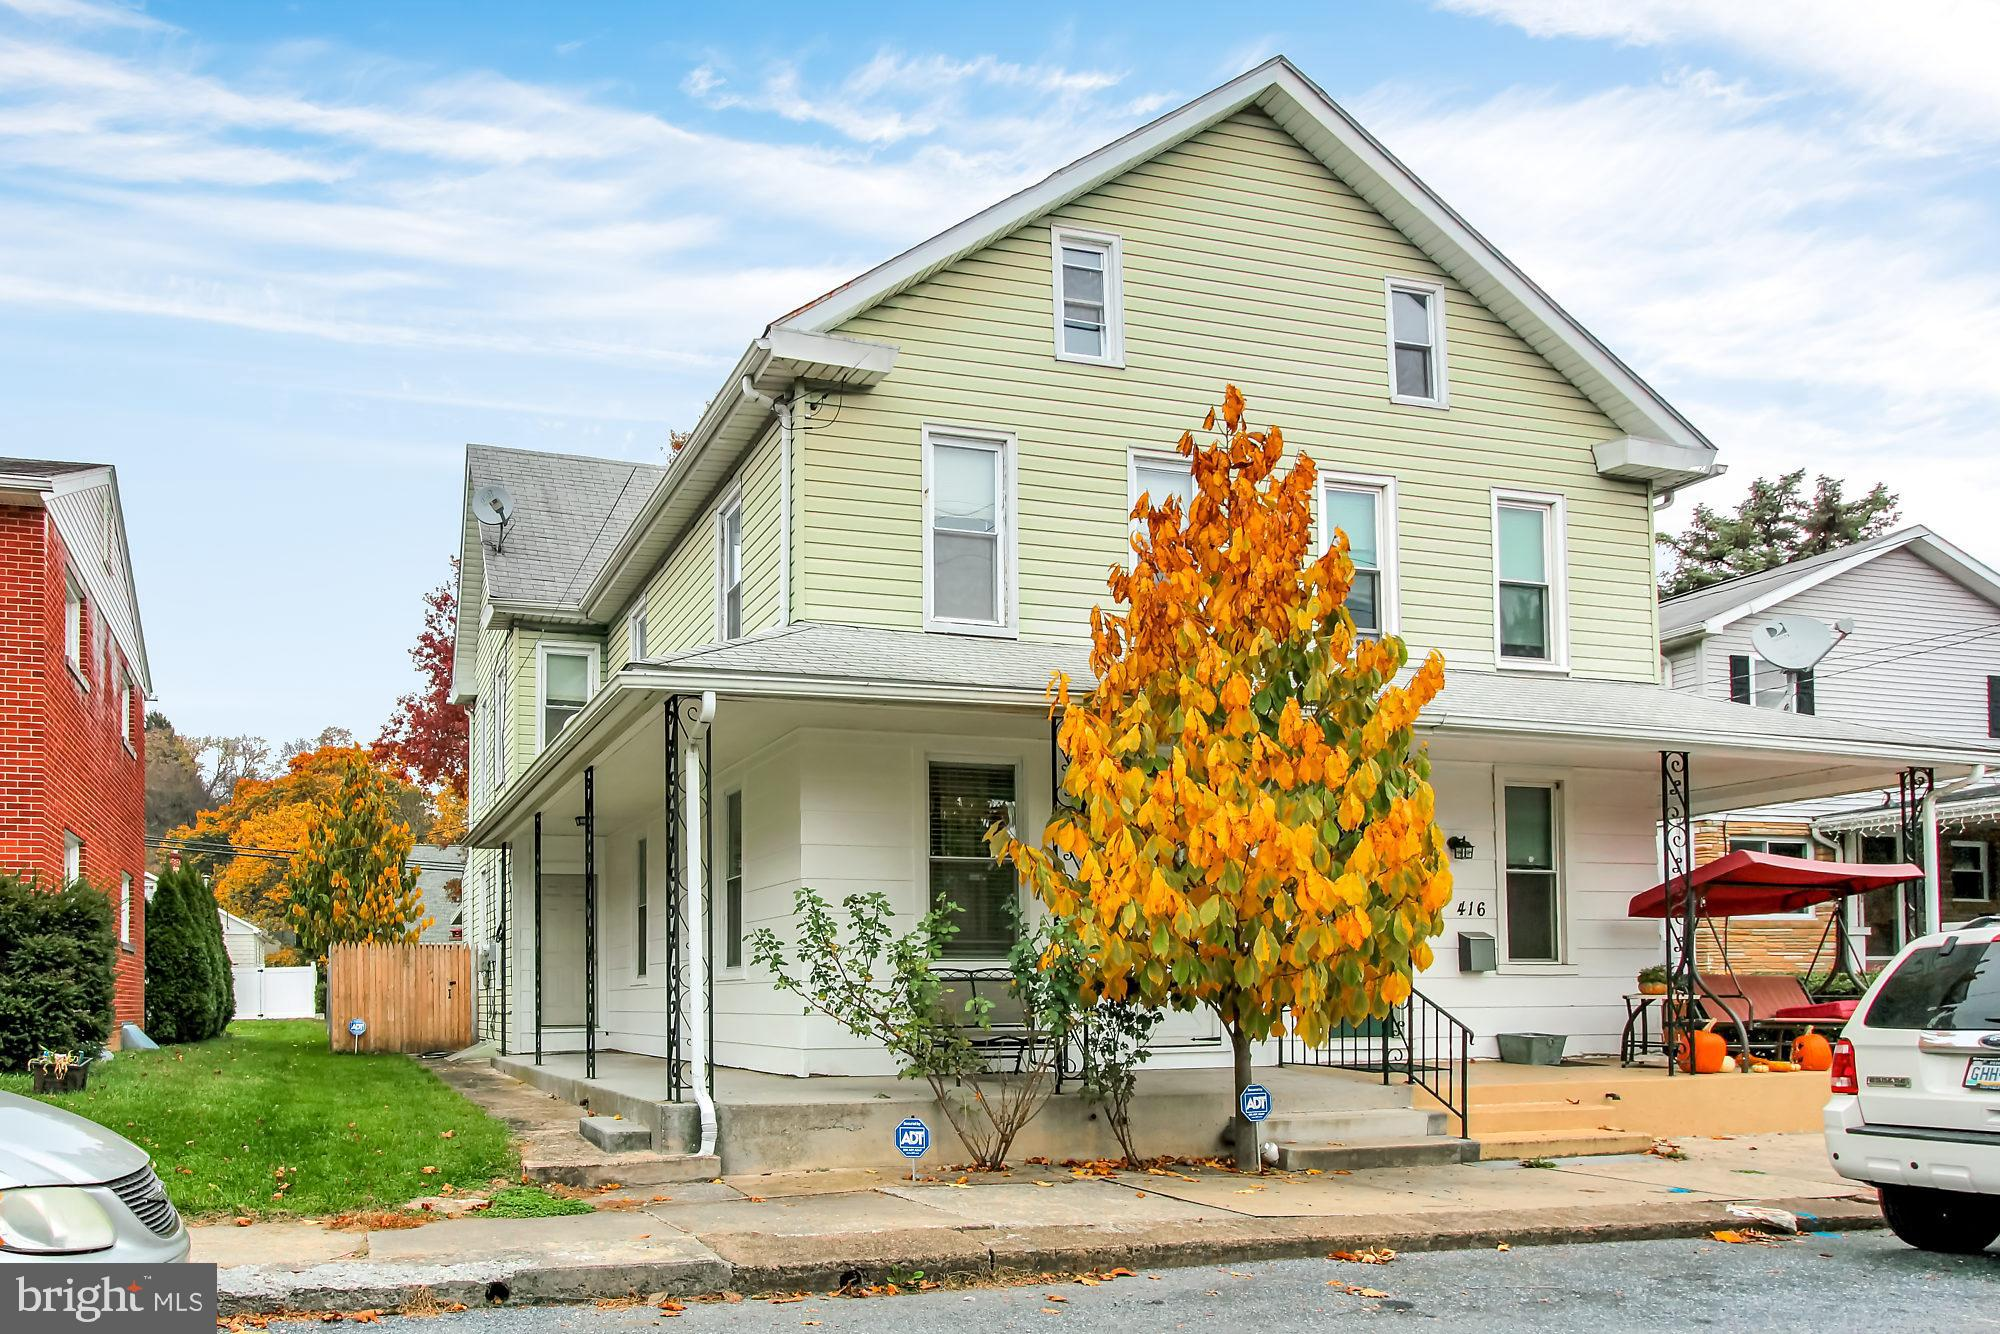 414 HIGH STREET, HIGHSPIRE, PA 17034